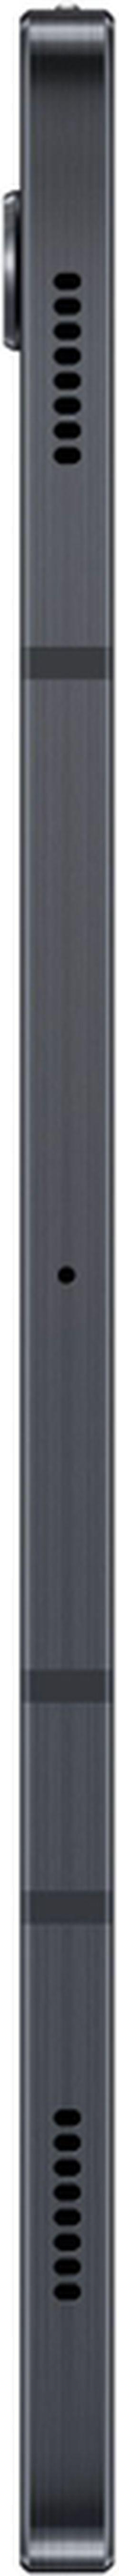 Tableta Samsung SM-T875 Galaxy Tab S7 6Gb/128Gb Black